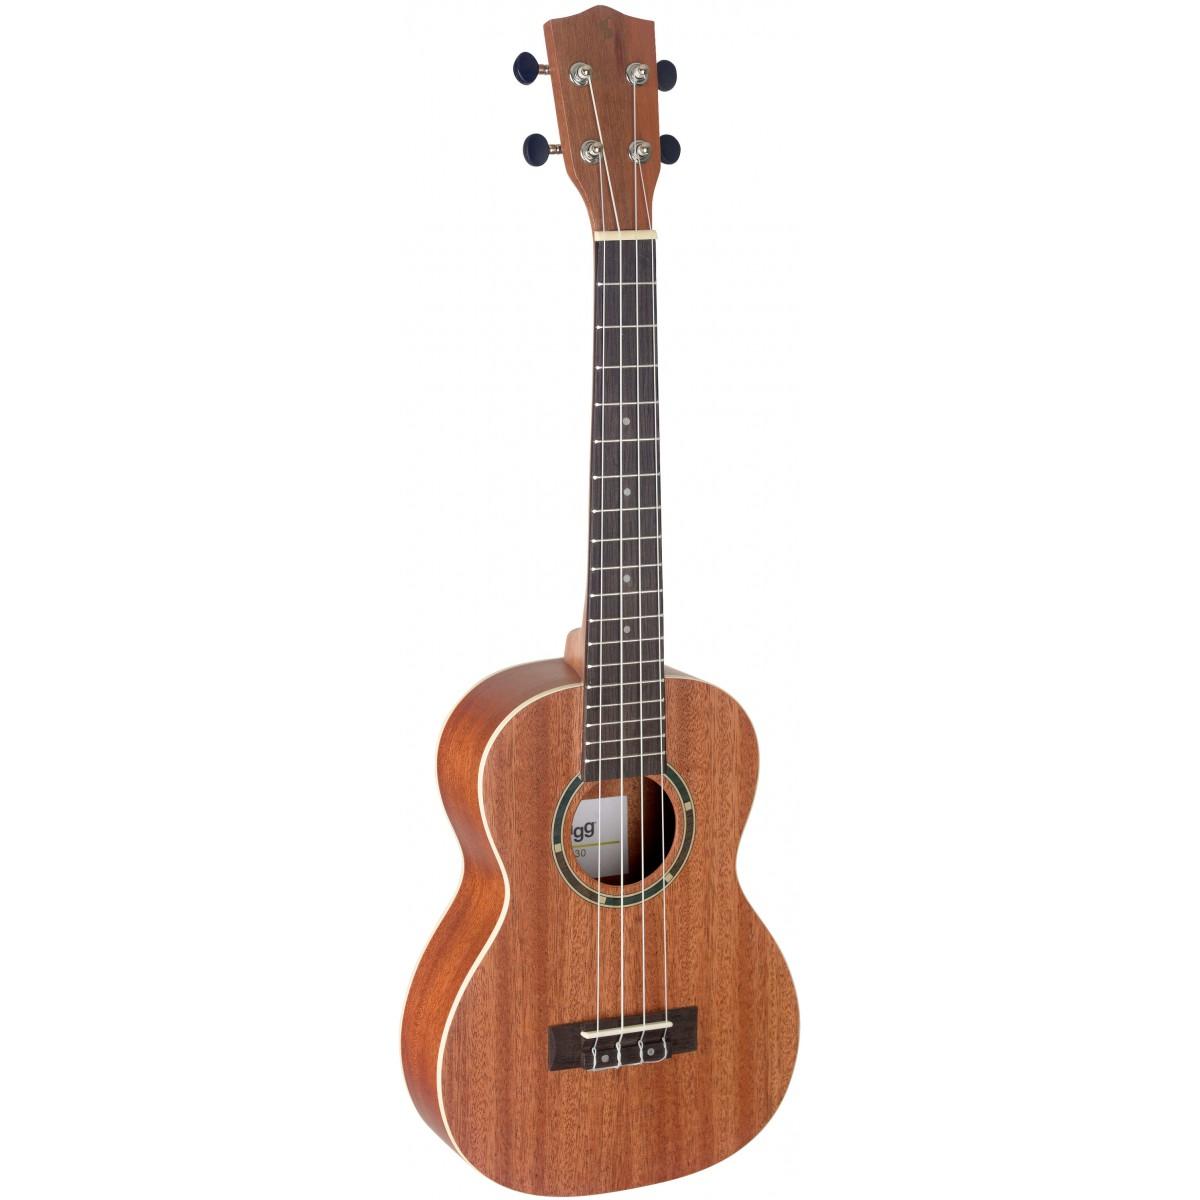 Stagg UT-30 tenor ukulele